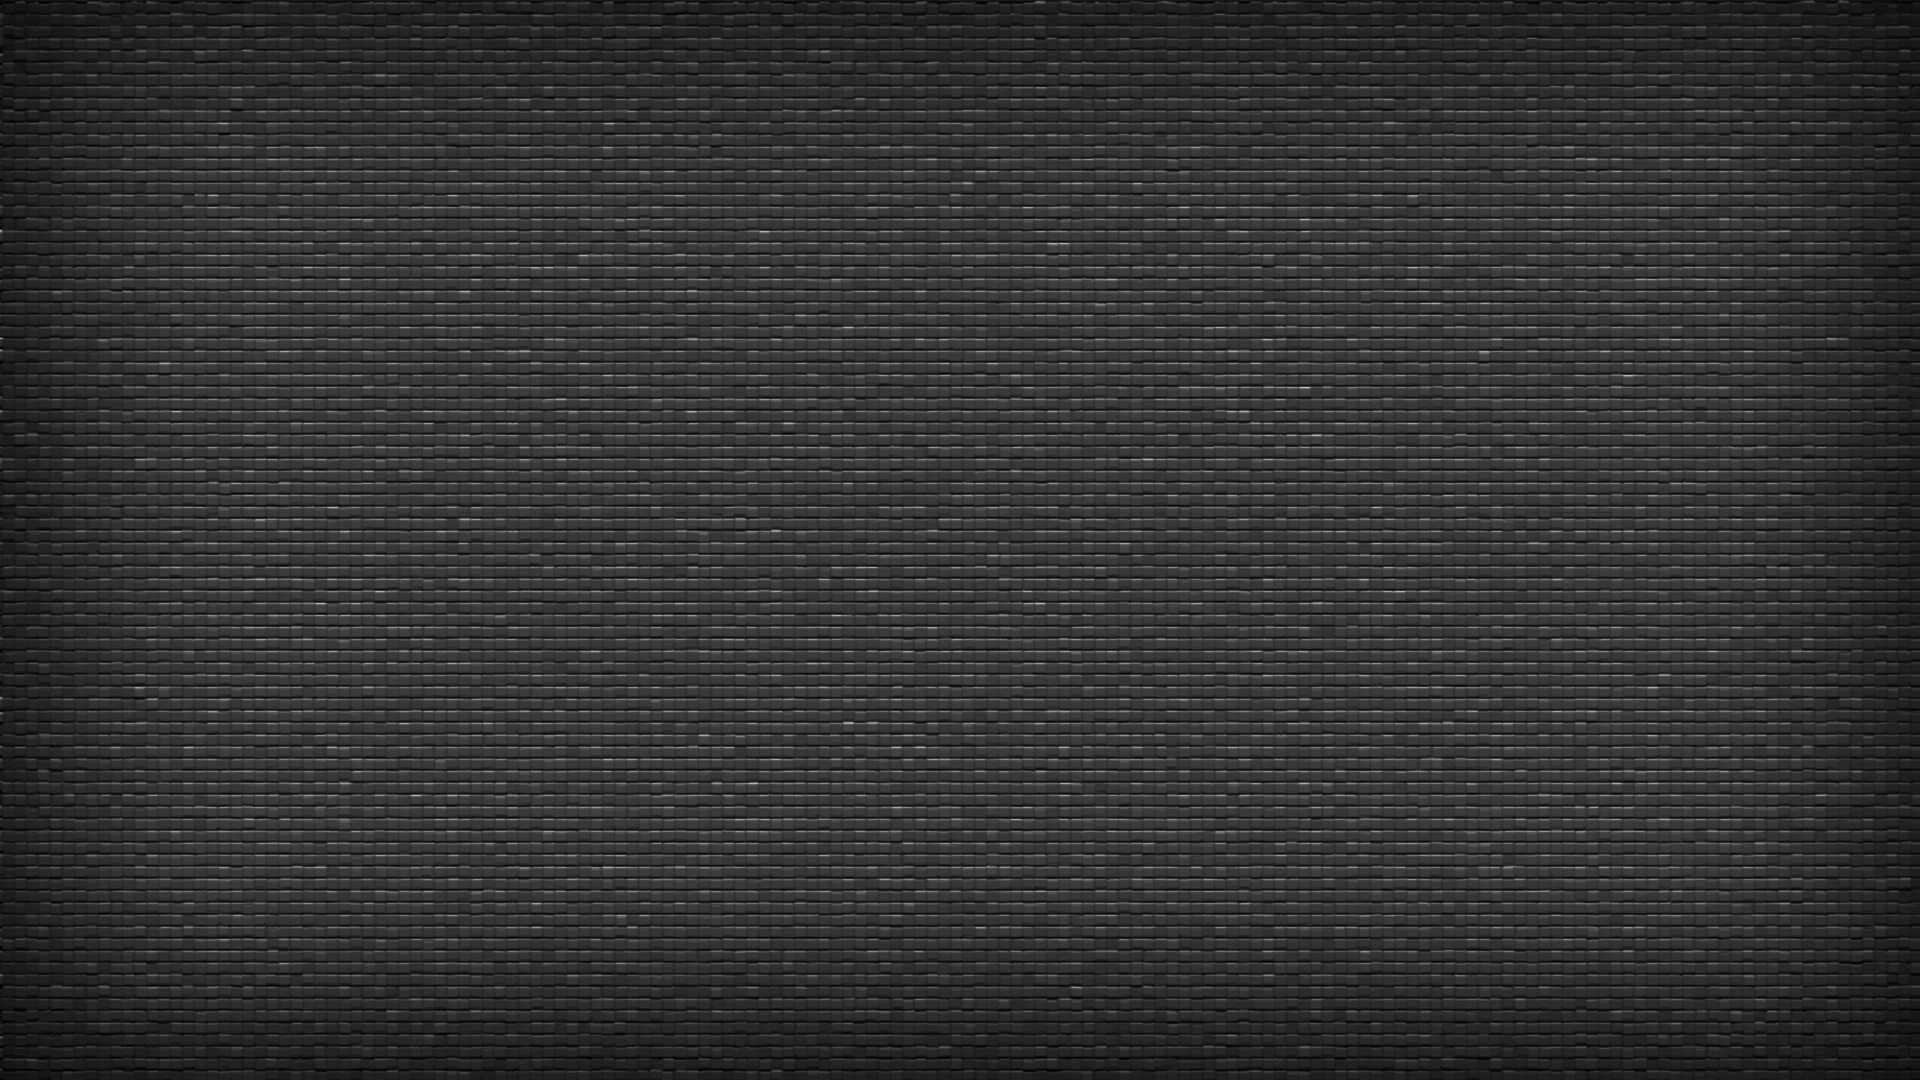 Simple Textured Wallpaper By Rossyallen2 On DeviantArt